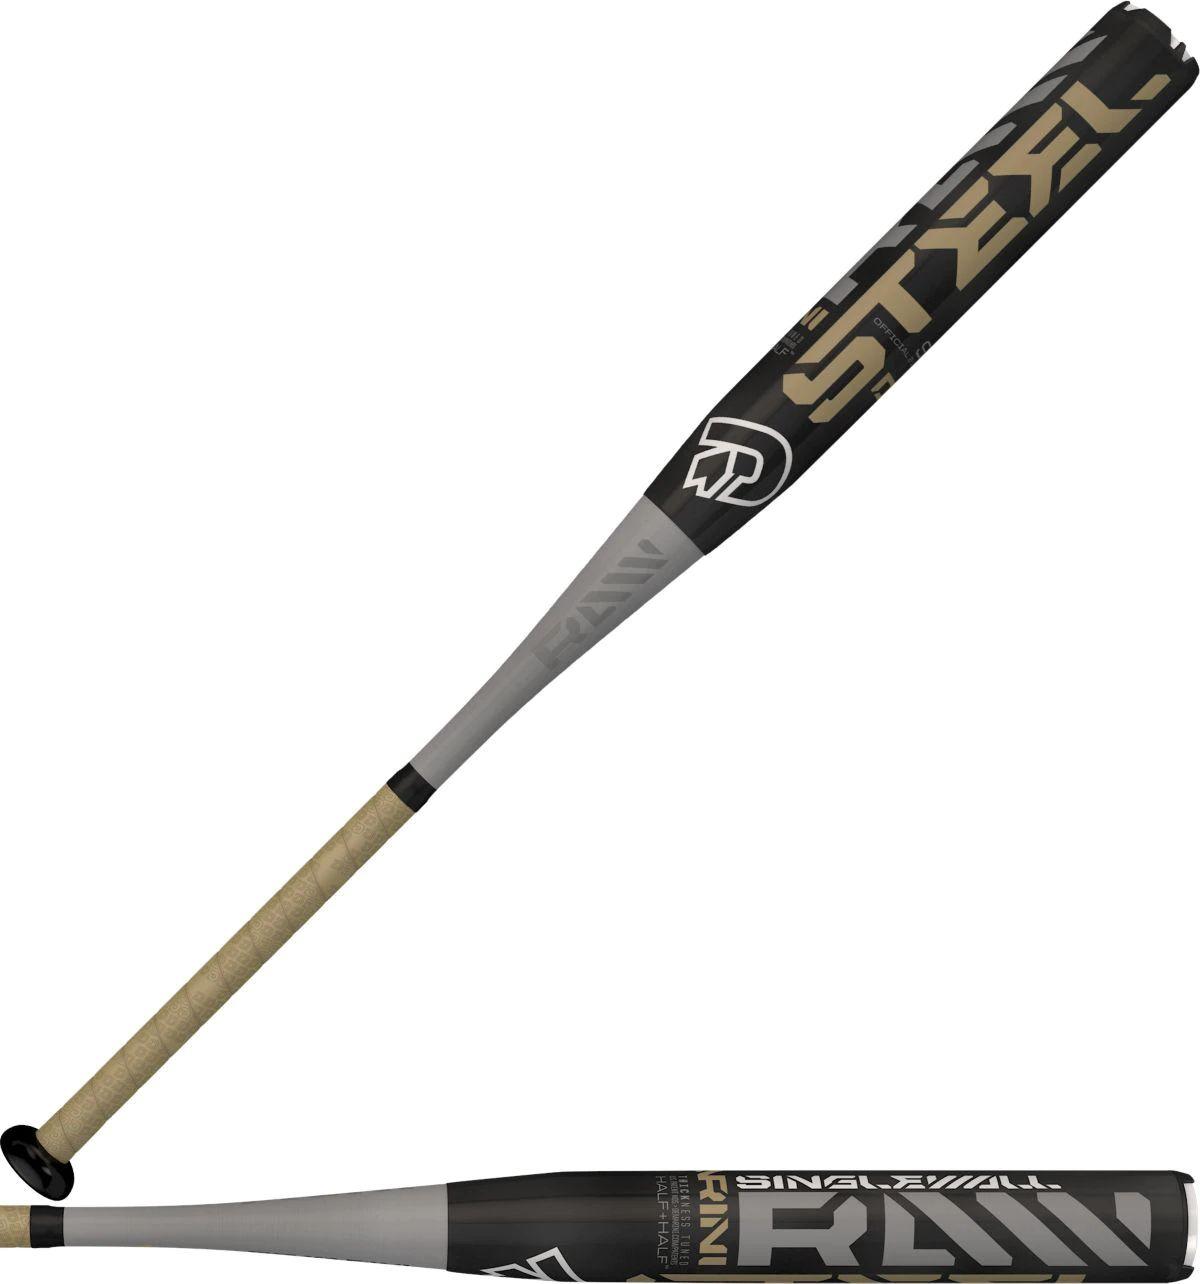 9864ef2d0bf The 8 Best Softball Bats of 2019